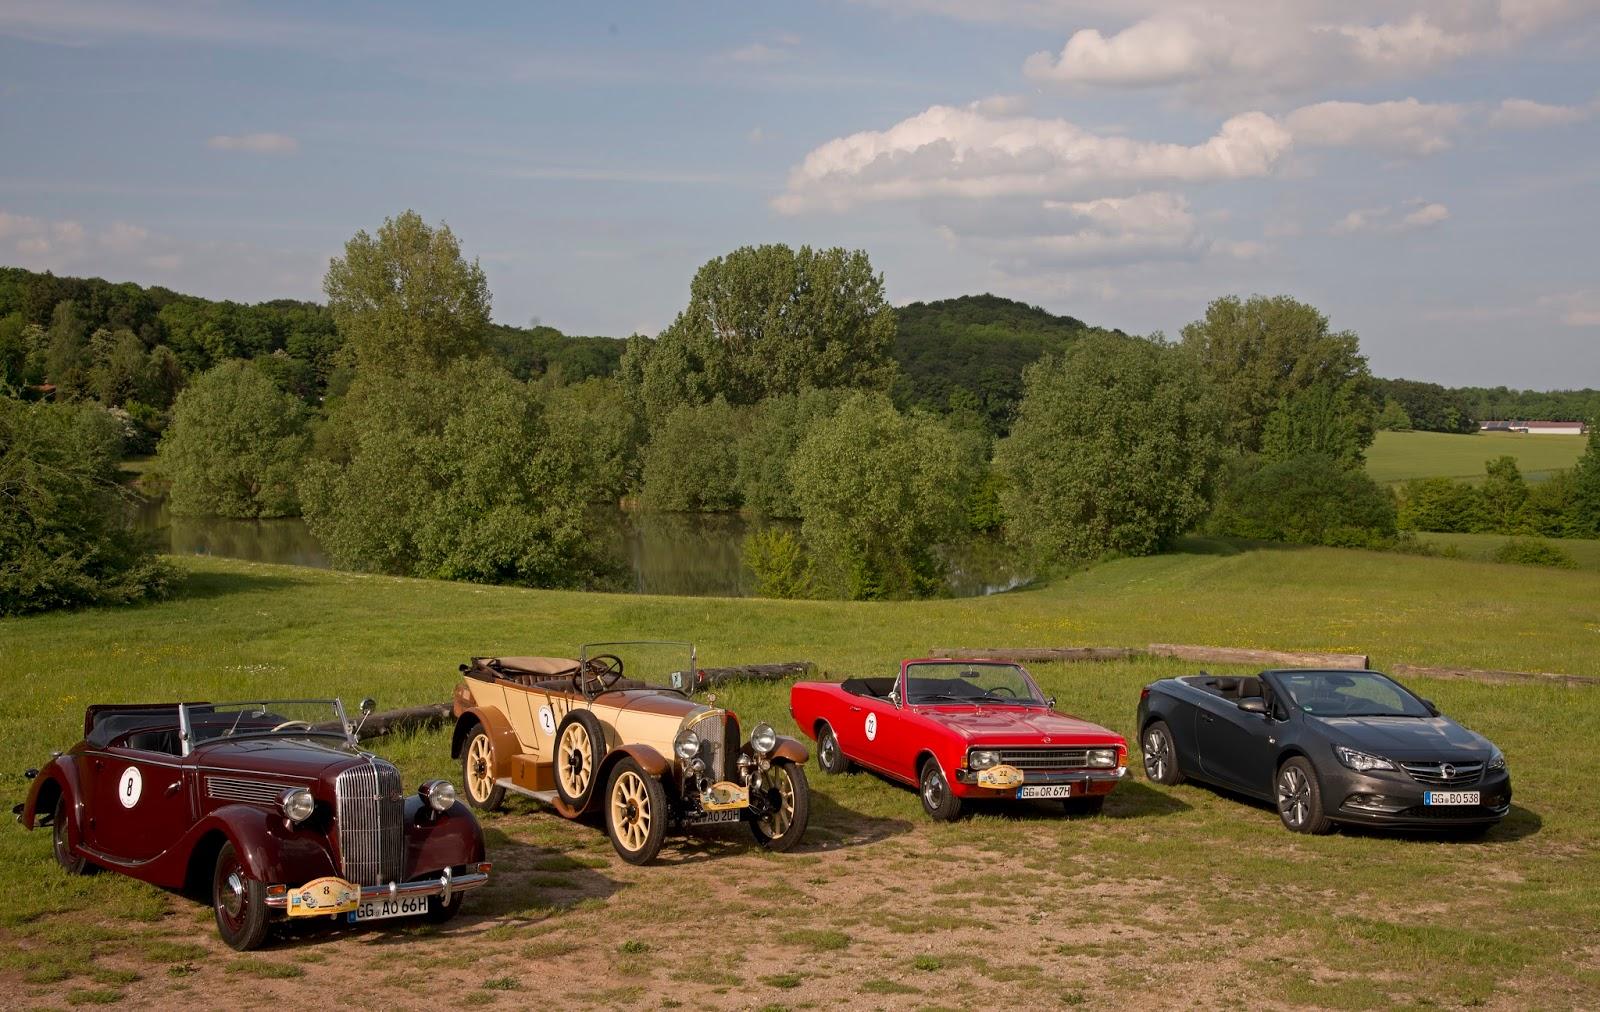 Opel Rallye Hessen Thueringen 2016 301188 Ταξίδι στο χρόνο μέσα από την ιστορία 100 χρόνων των Opel Cabrio cabrio, Opel, Opel 8/25 hp, Opel Cascada, Opel Olympia, Opel Record